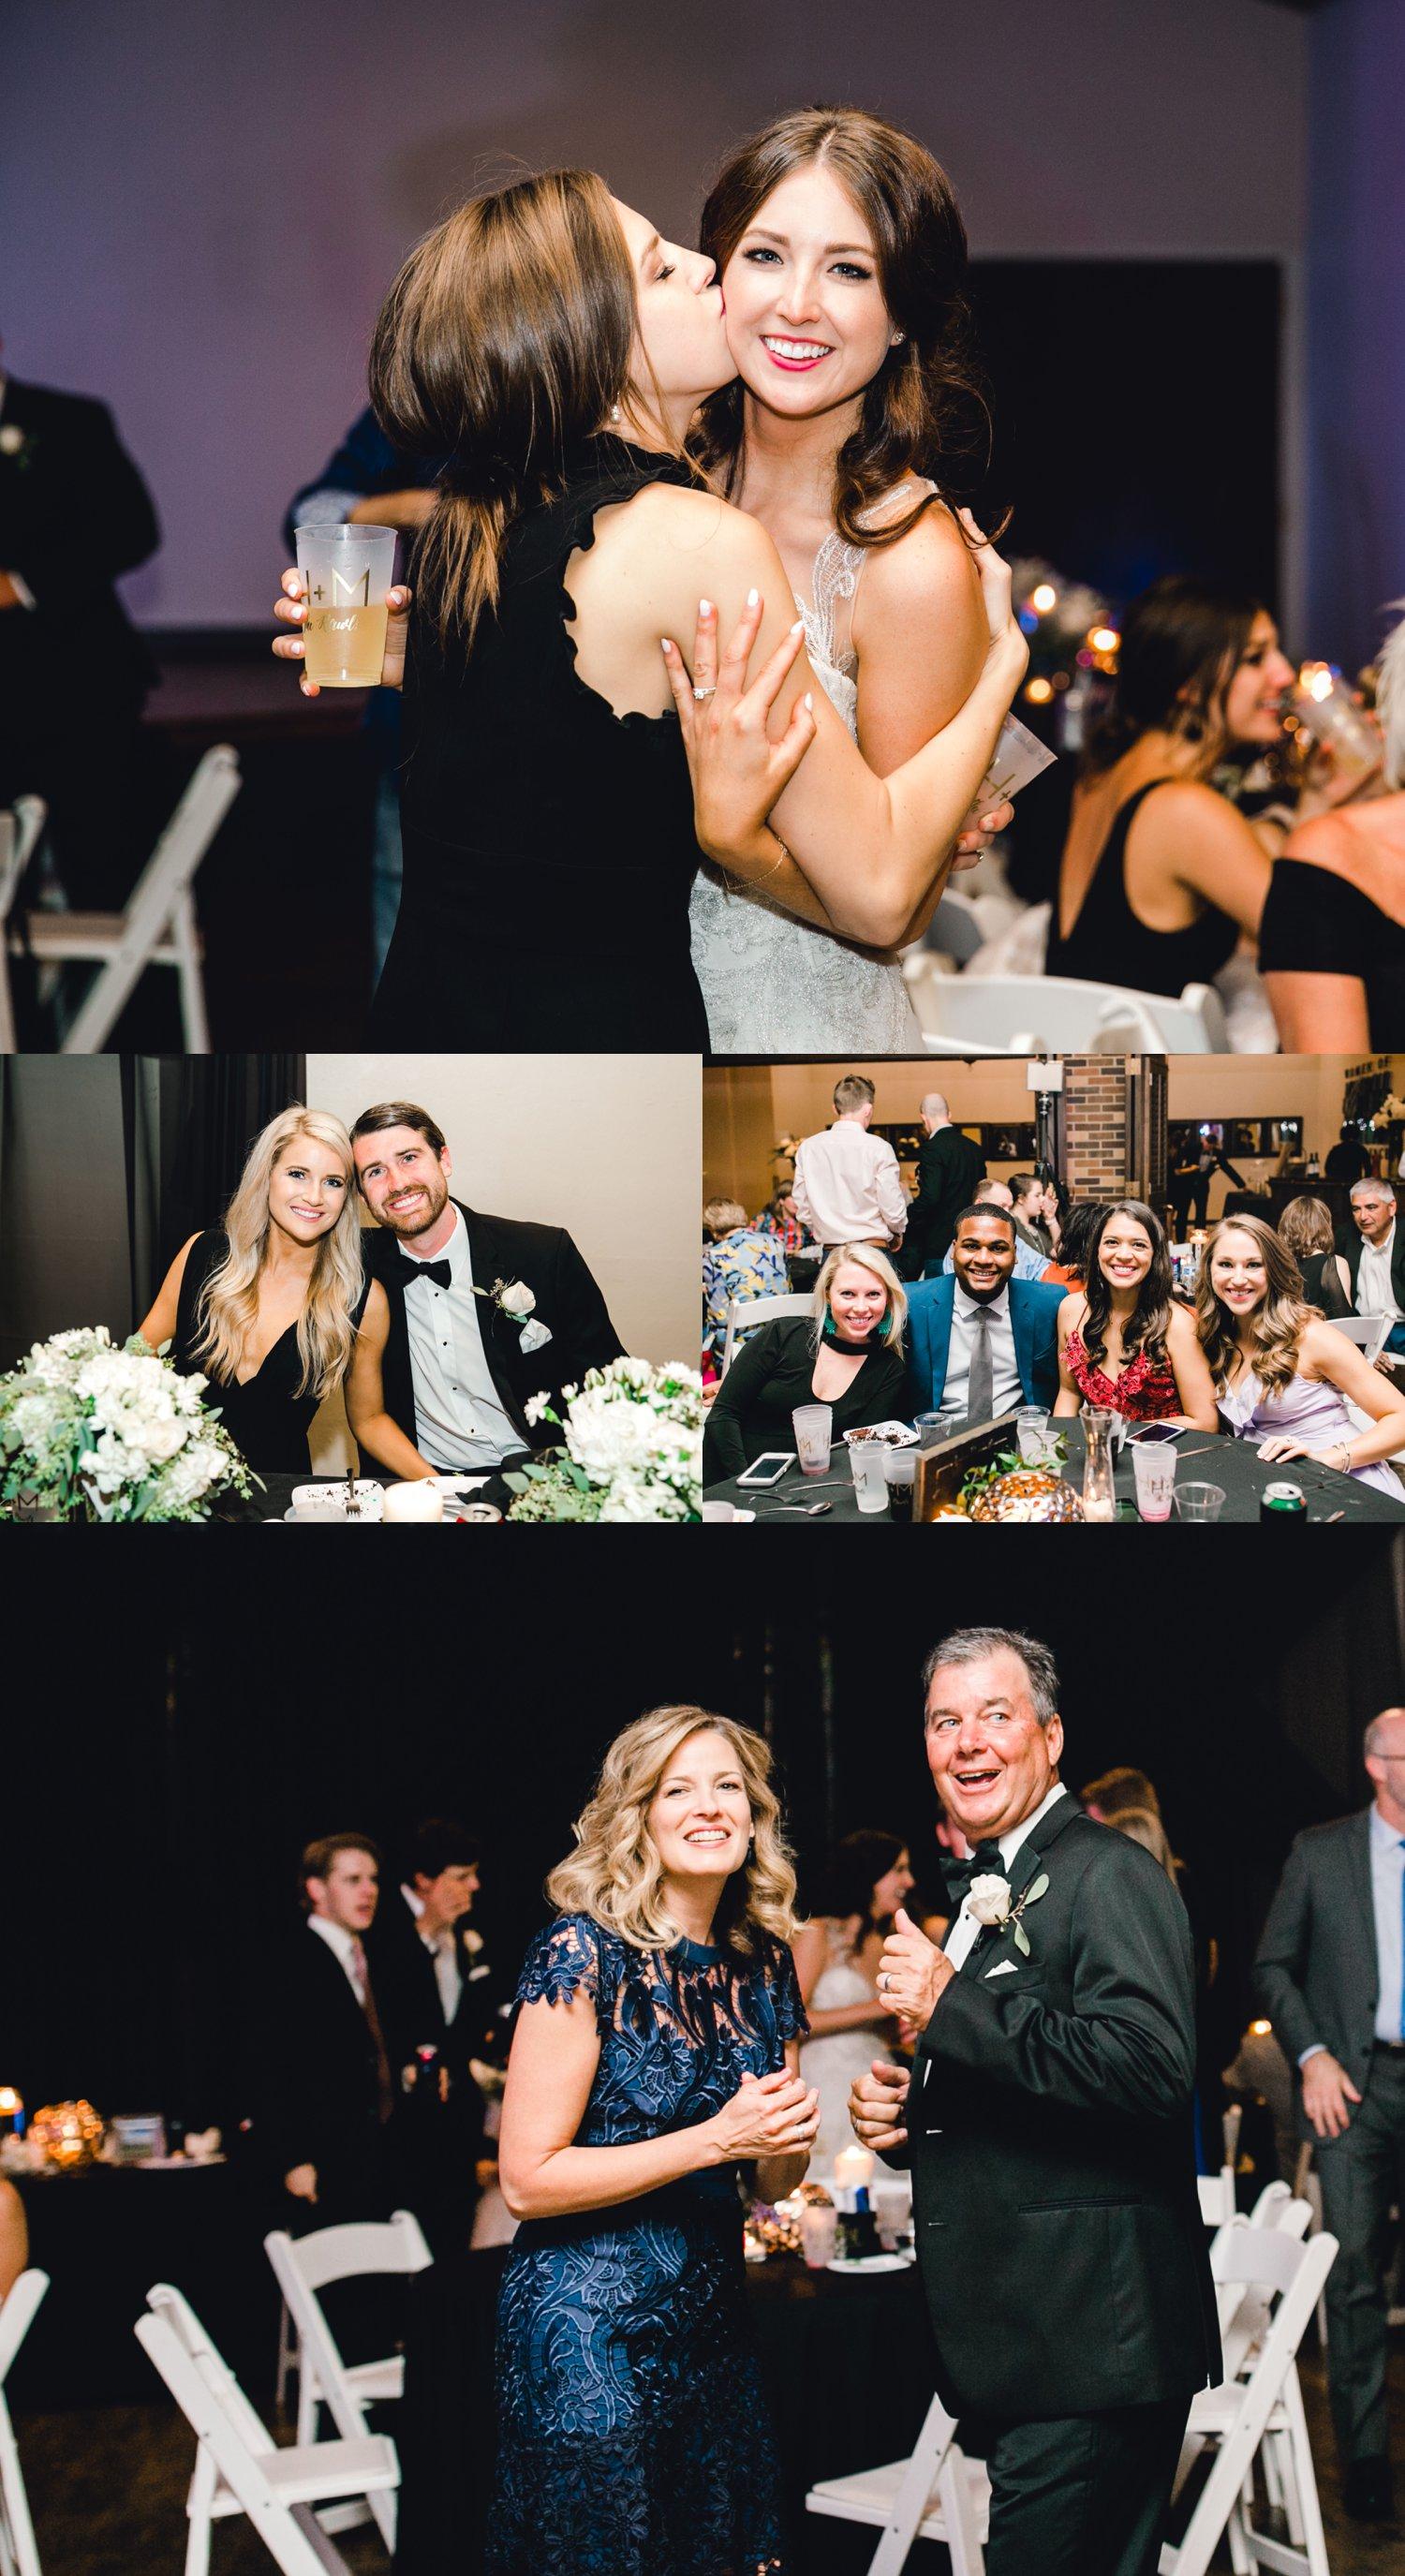 Hunter_and_Molly_Rawls_ALLEEJ_Lubbock_WEDDING_Legacy_Event_Center_0200.jpg